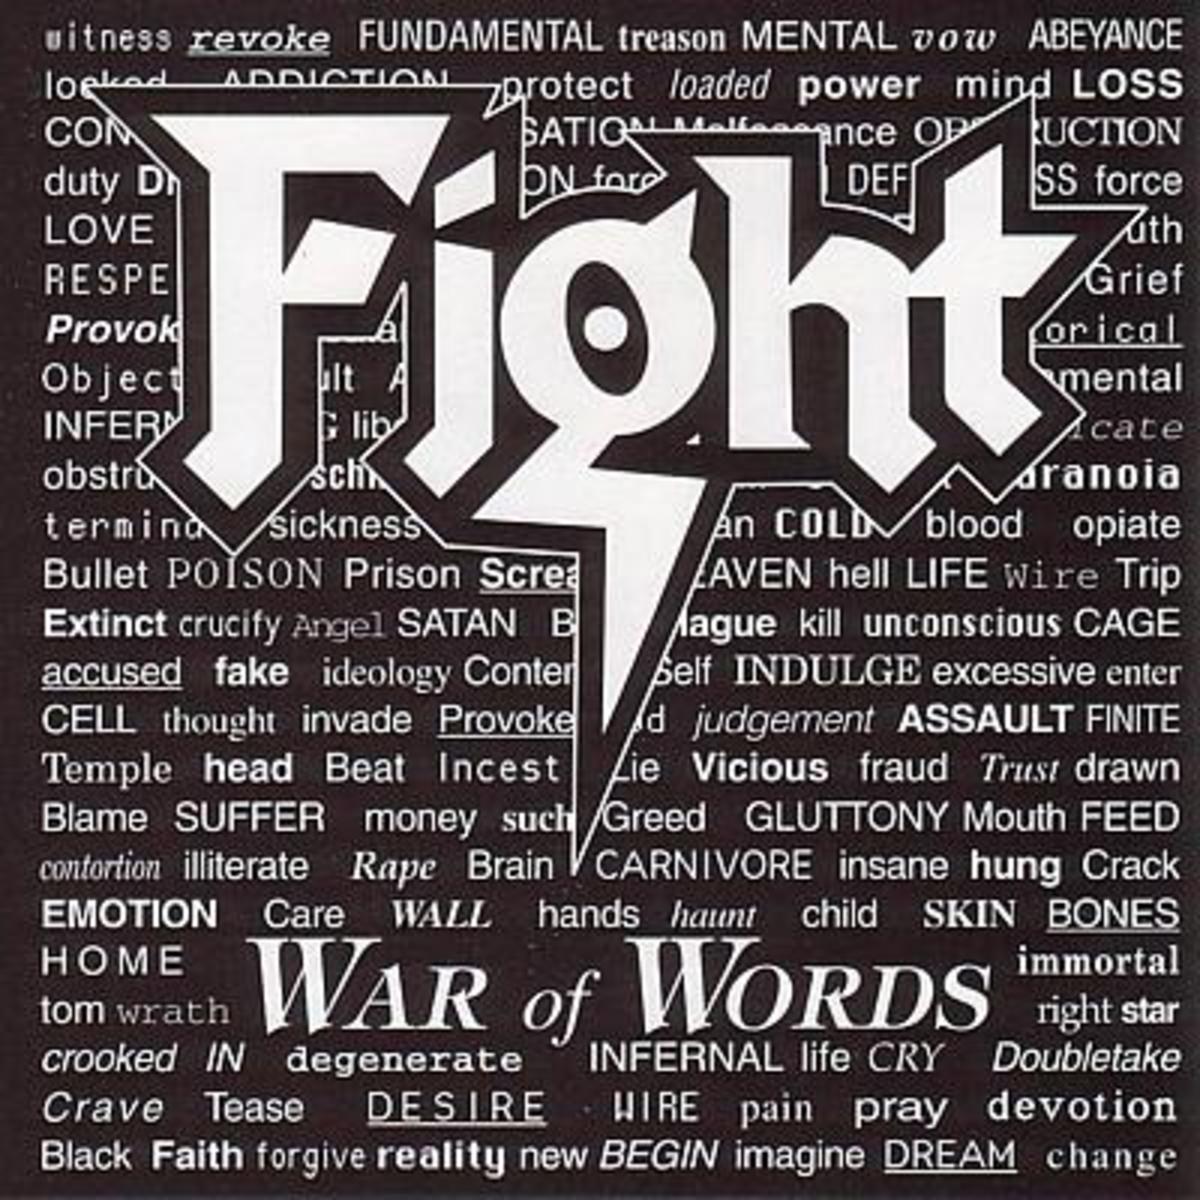 Forgotten Hard Rock Albums: Fight's 'War of Words'